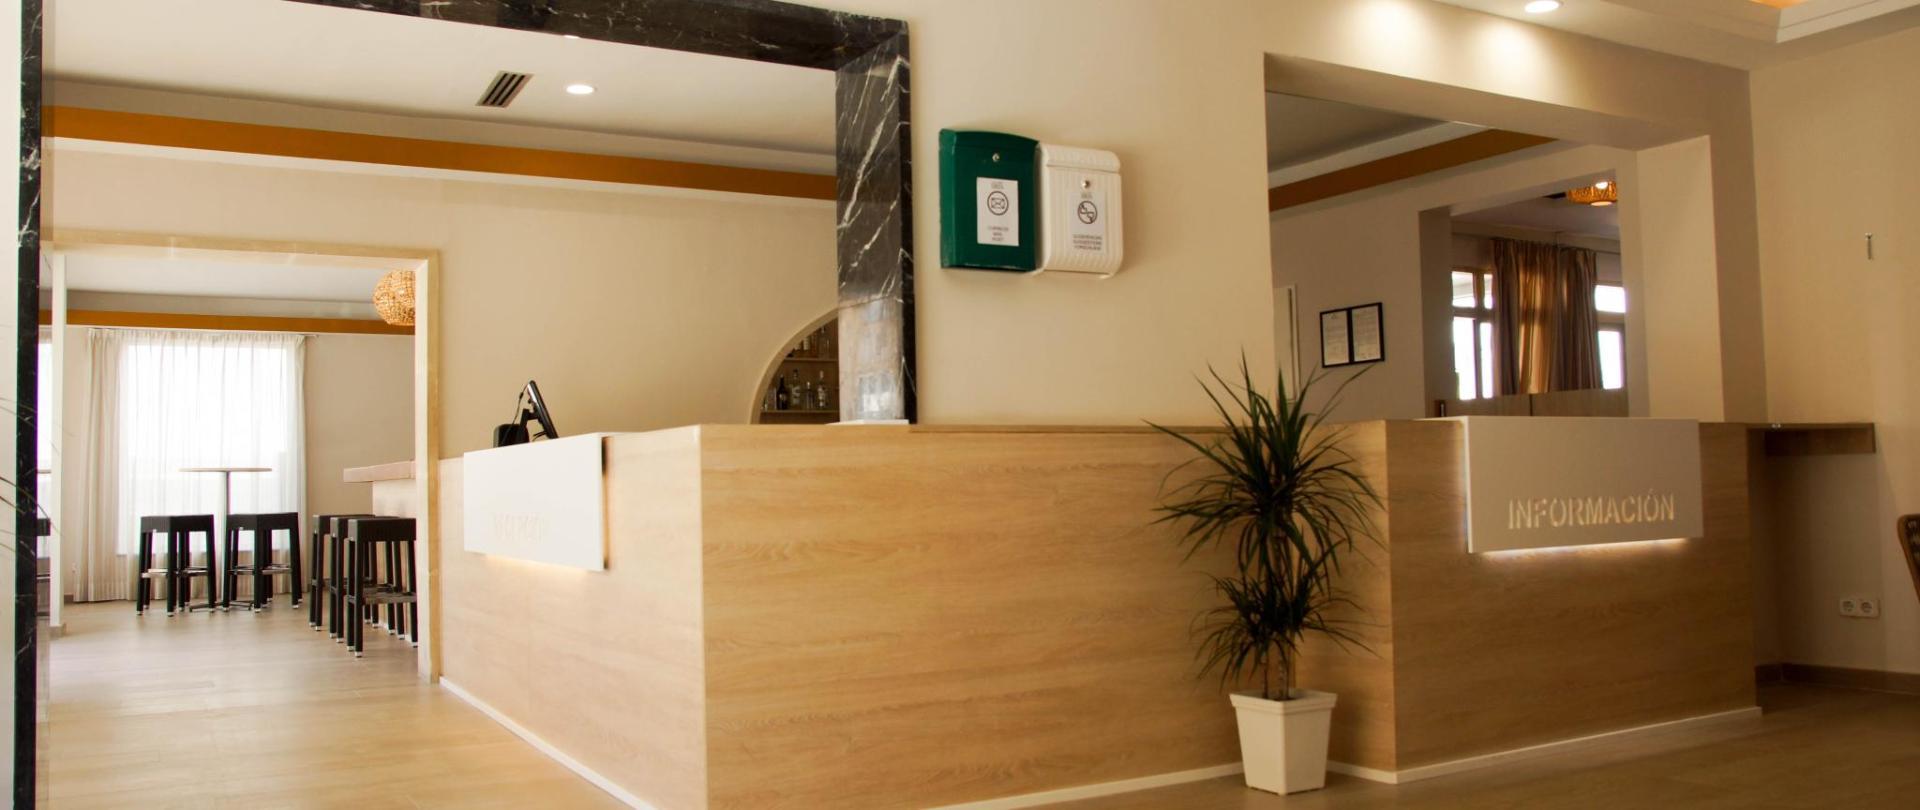 012_hotel_iris_mallorca_12.jpg